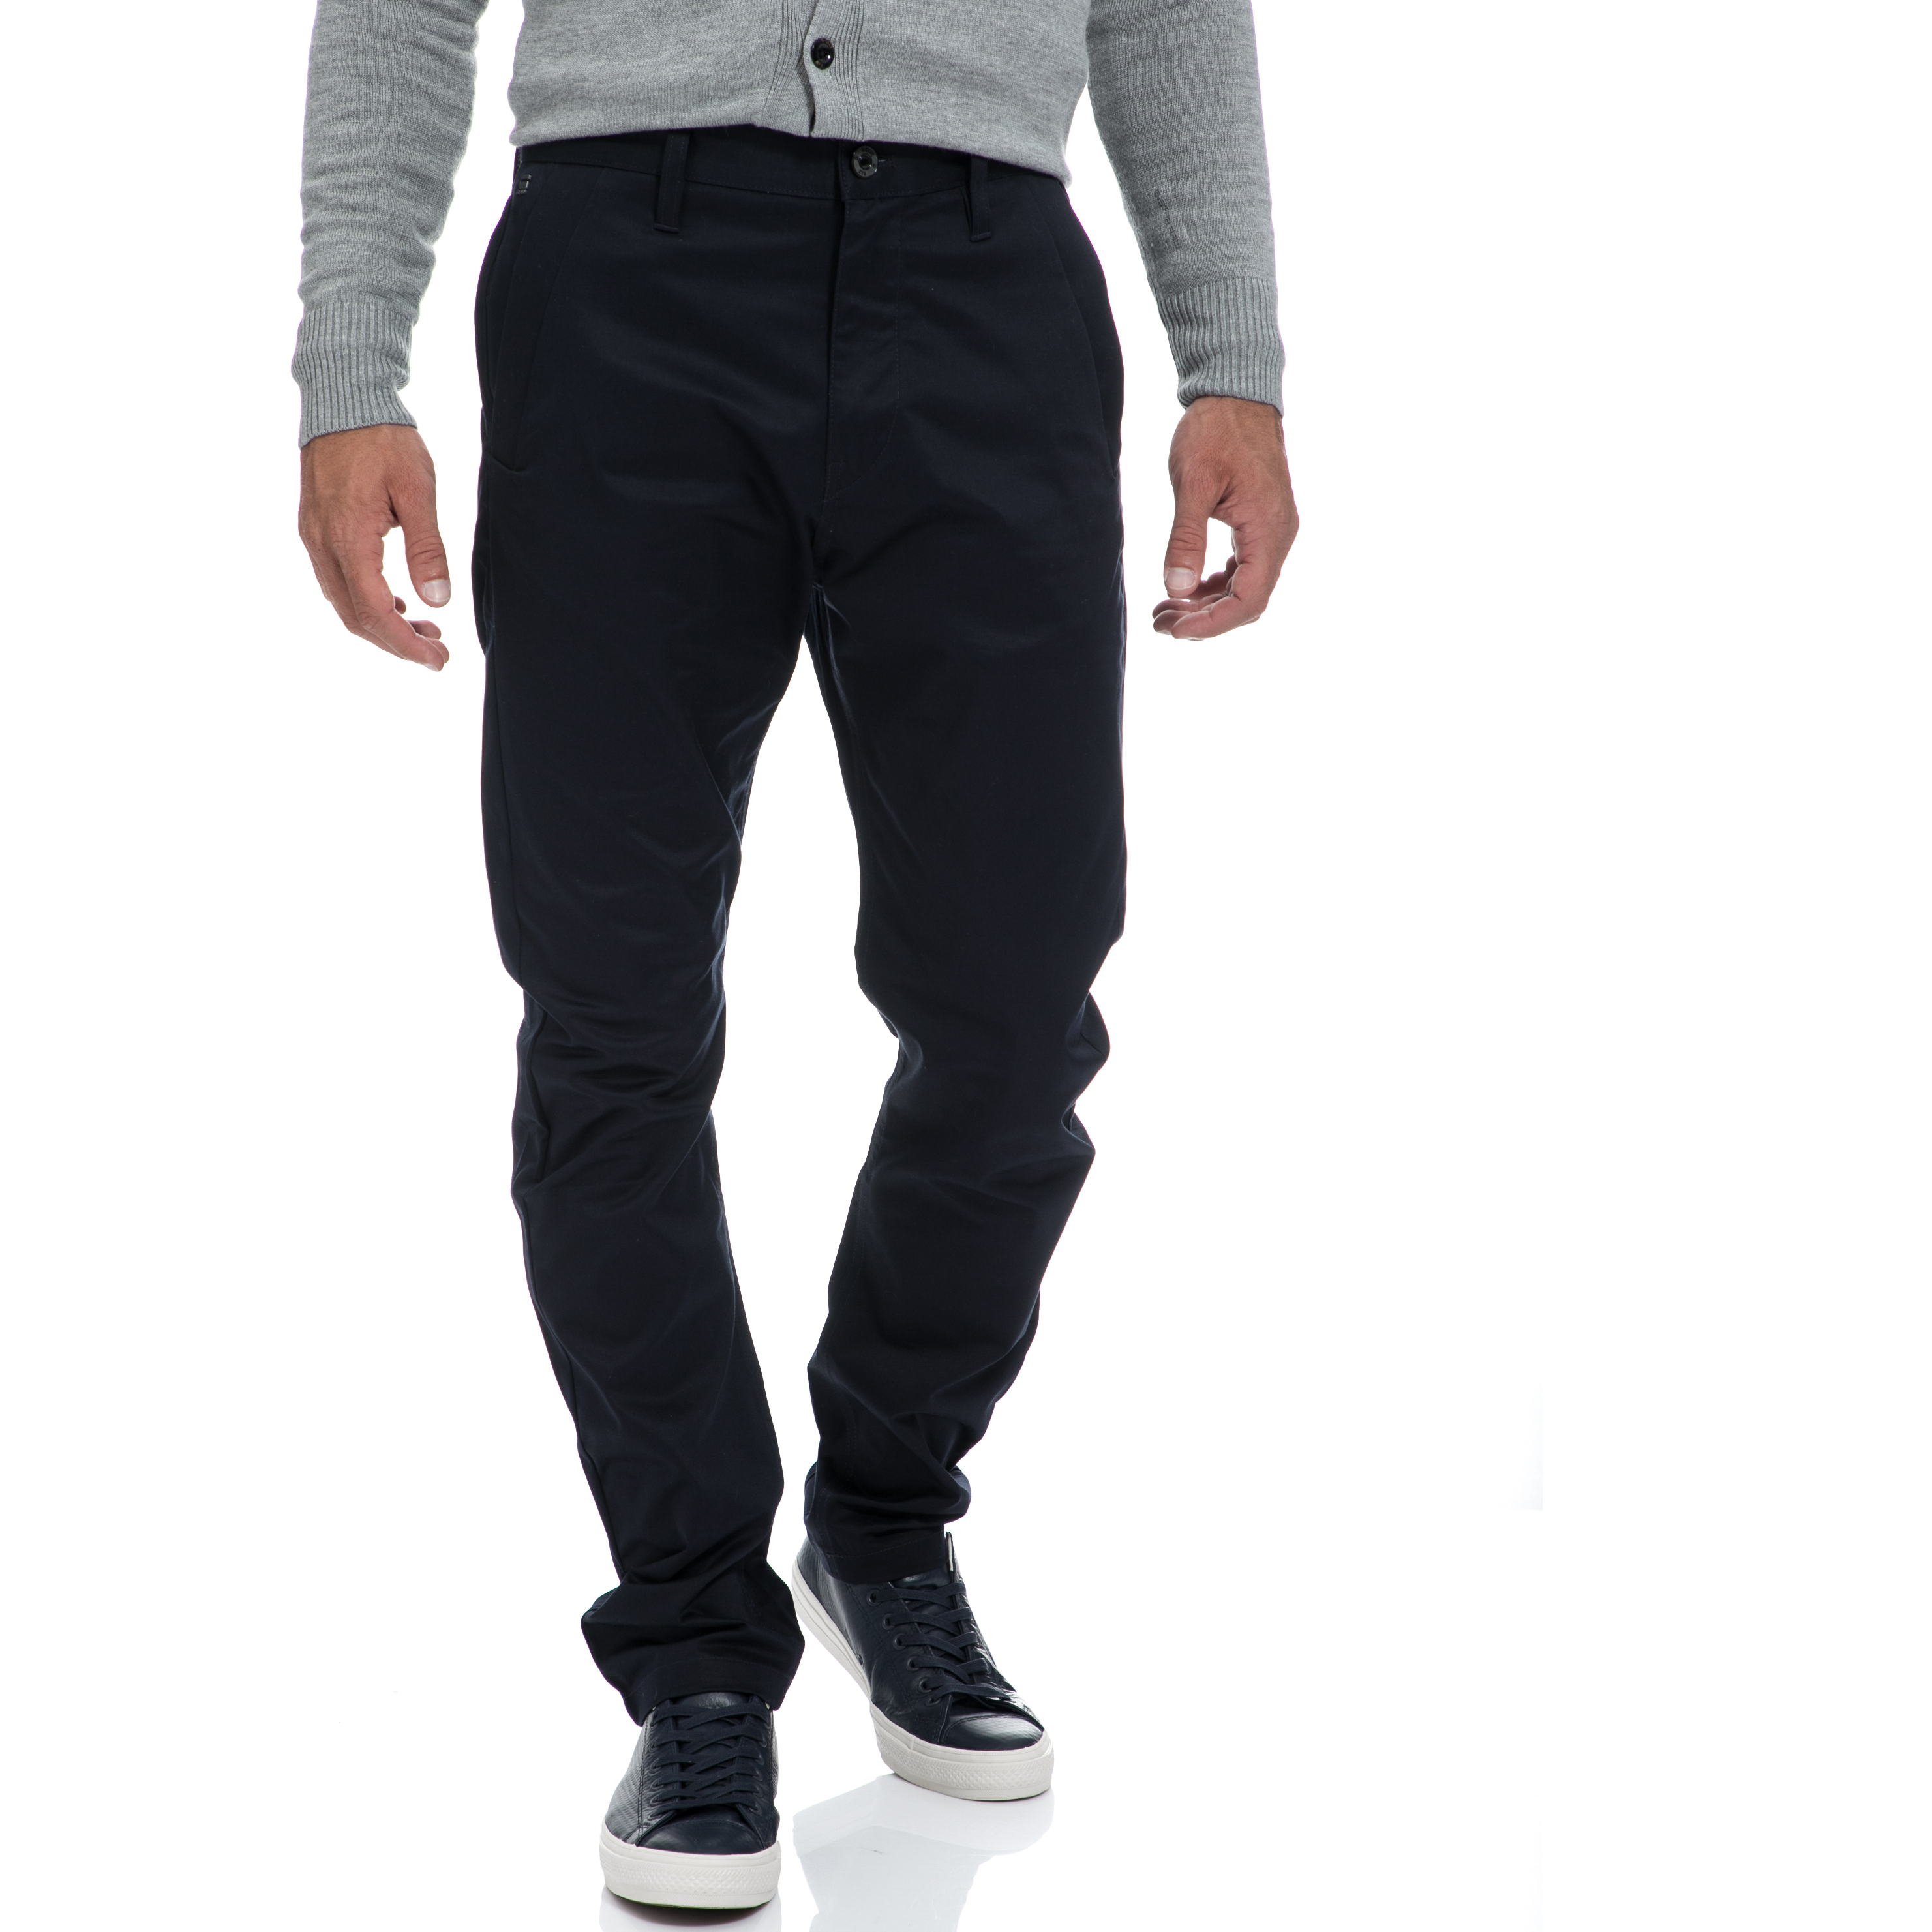 G-STAR RAW - Αντρικό παντελόνι G-STAR RAW μπλε ανδρικά ρούχα παντελόνια chinos